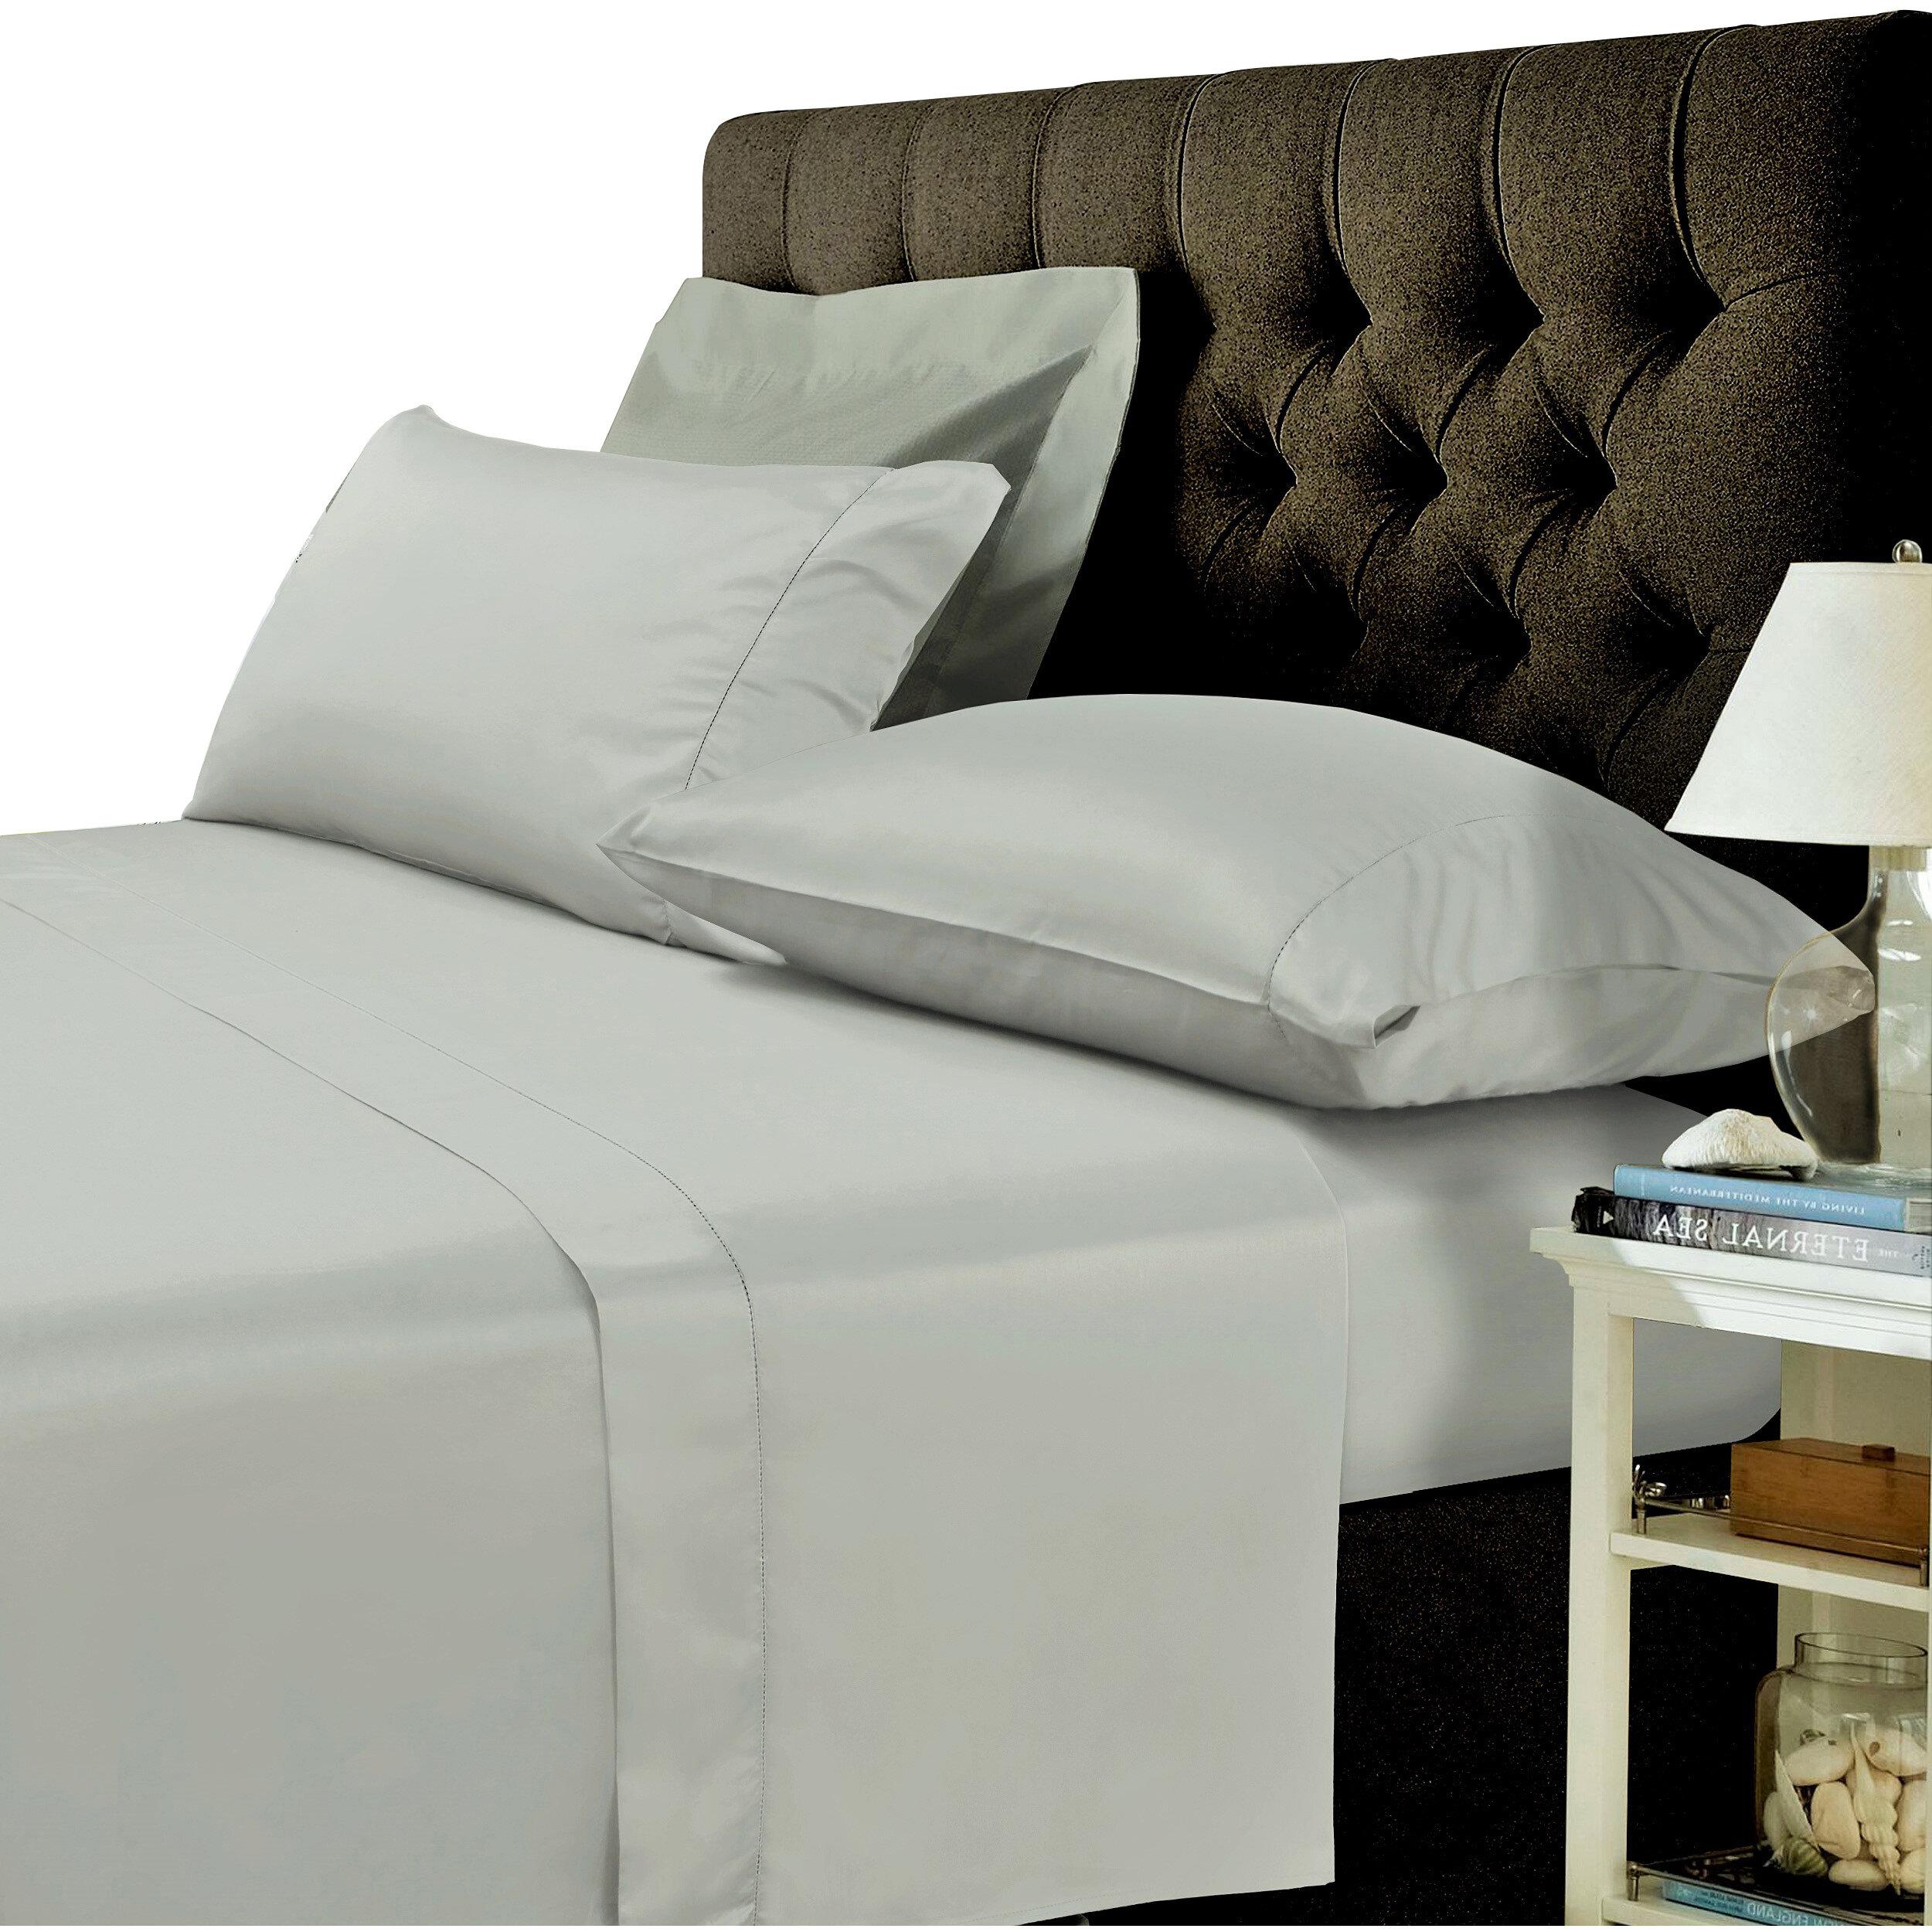 Tribeca Living 400 Thread Count Egyptian Quality Cotton Sheet Set U0026 Reviews  | Wayfair